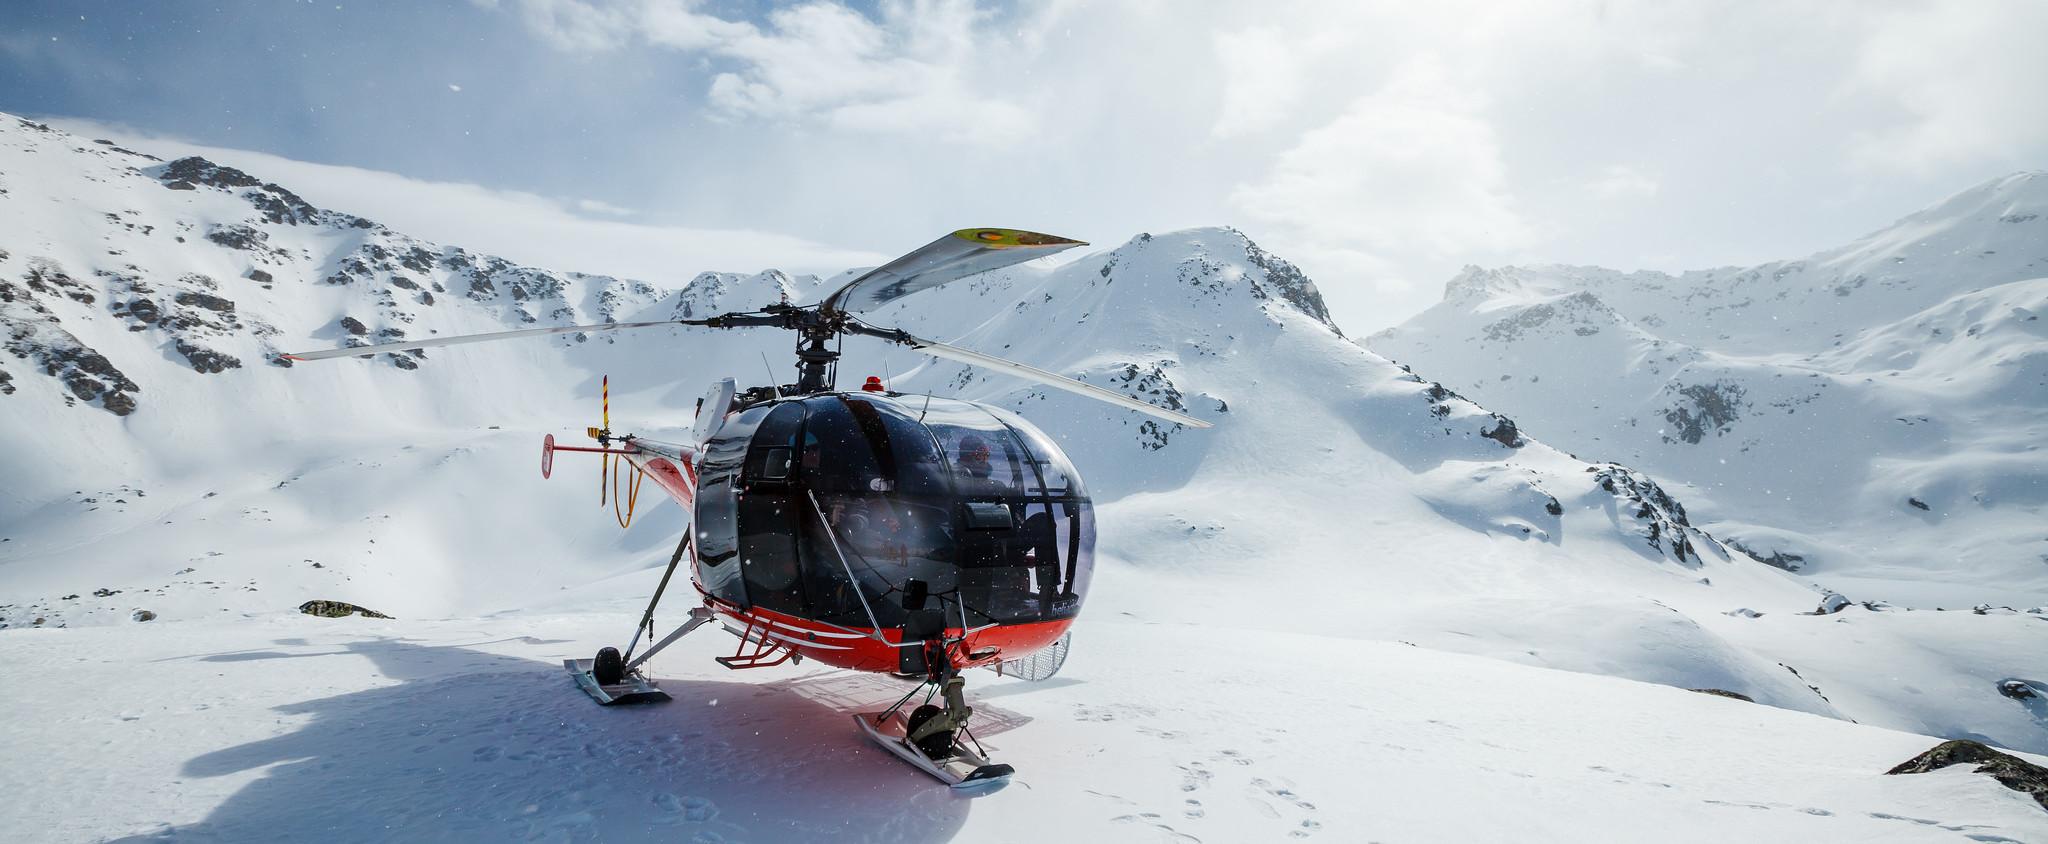 Heli-Skiing in the North Caucasus. Season 2018